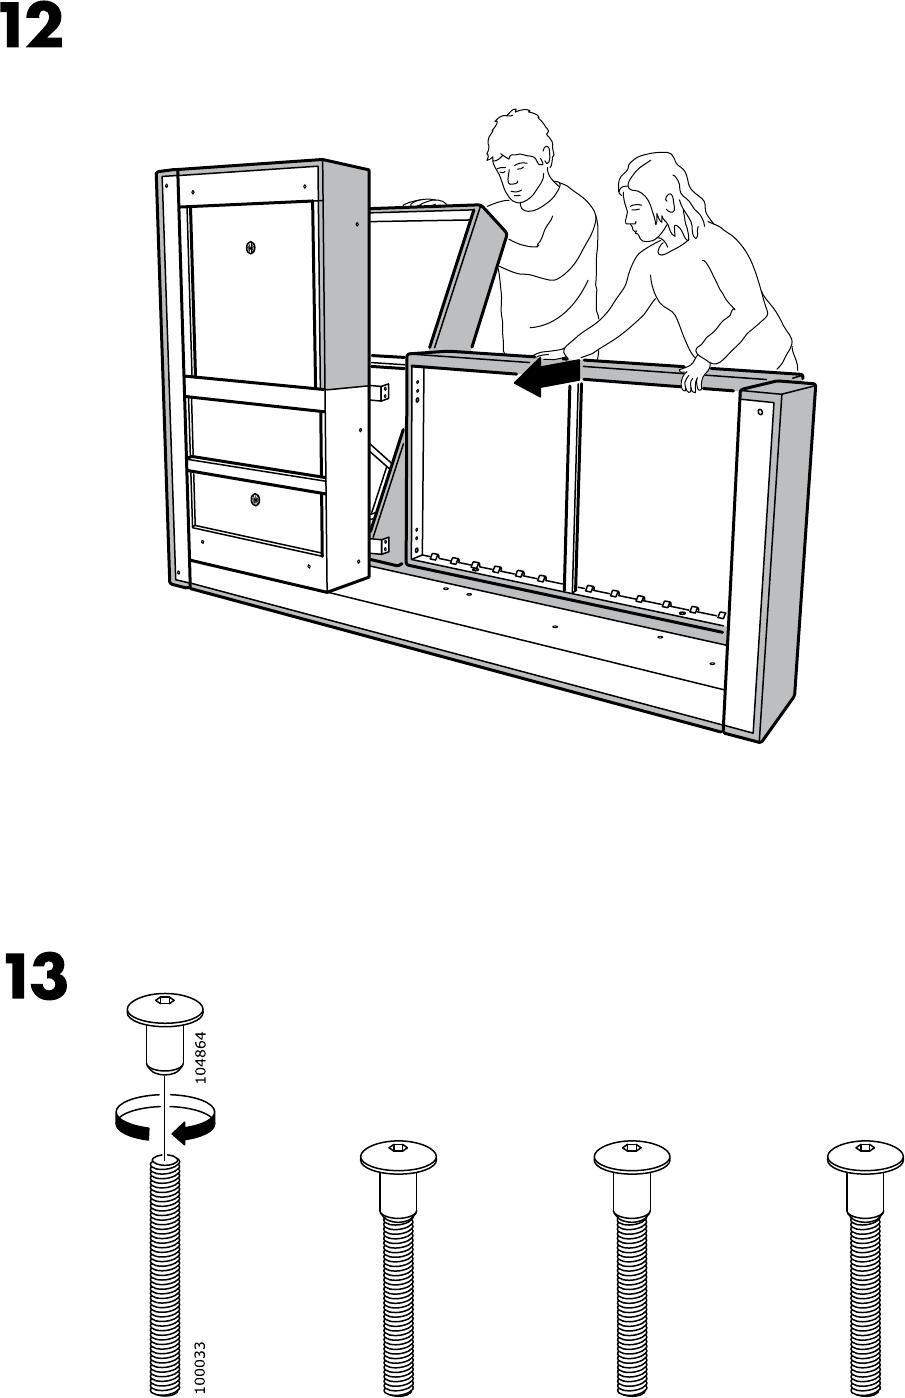 Ikea Aspelund Garderobekast Handleiding ~ Handleiding Ikea FRIHETEN (pagina 11 van 28) (1,93 mb Alle talen)